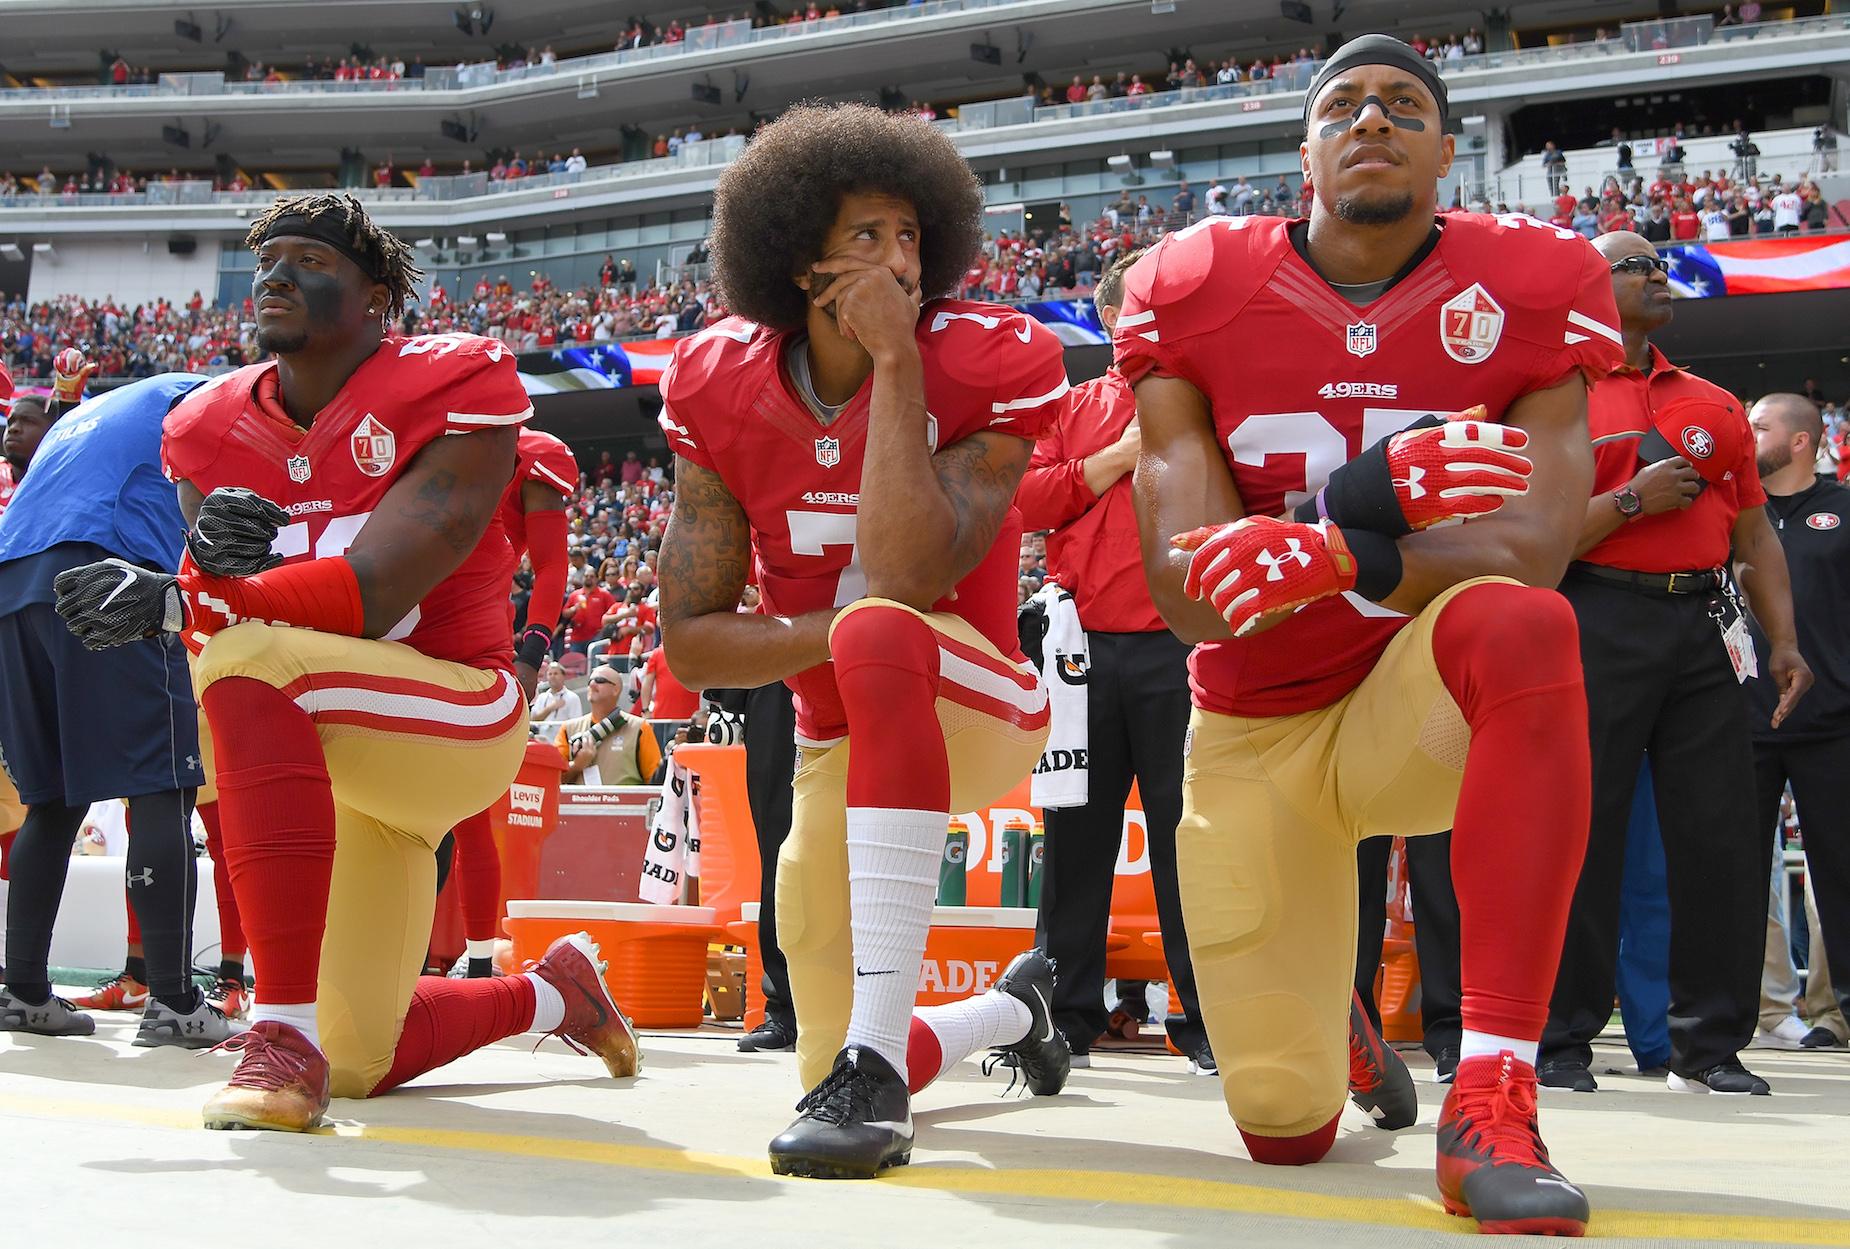 Colin Kaepernick called the NFL's social justice initiatives 'propaganda' in a tweet.